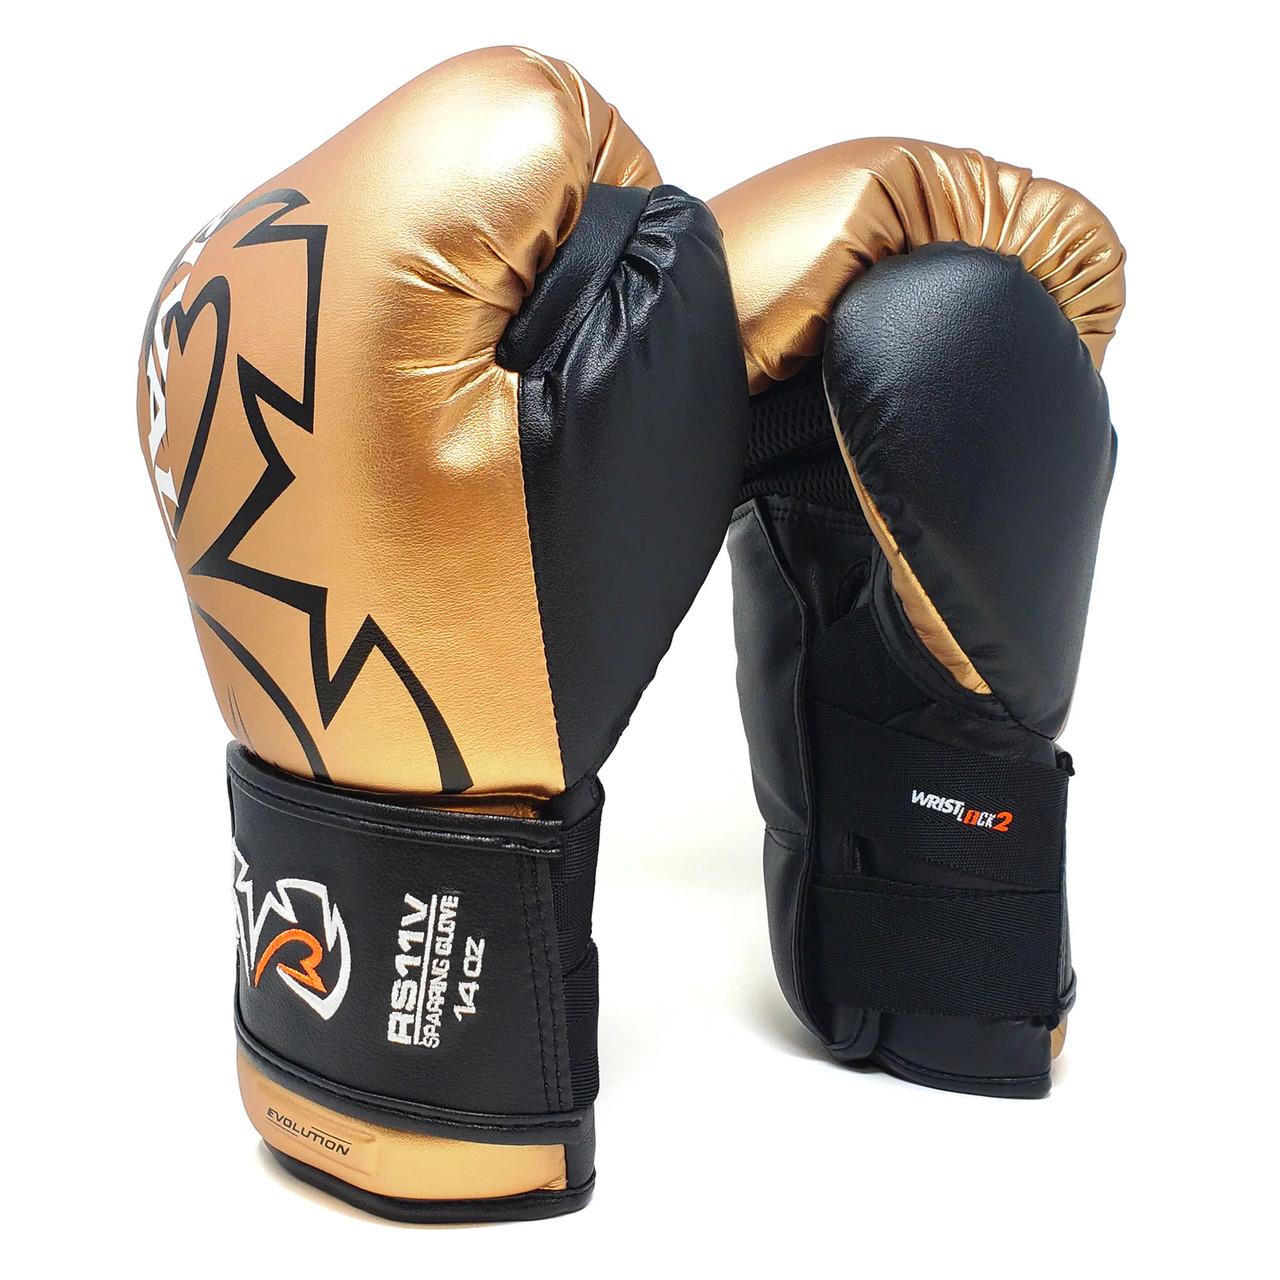 Gold Rival RS11V-Evolution Hook and Loop Sparring Boxing Gloves